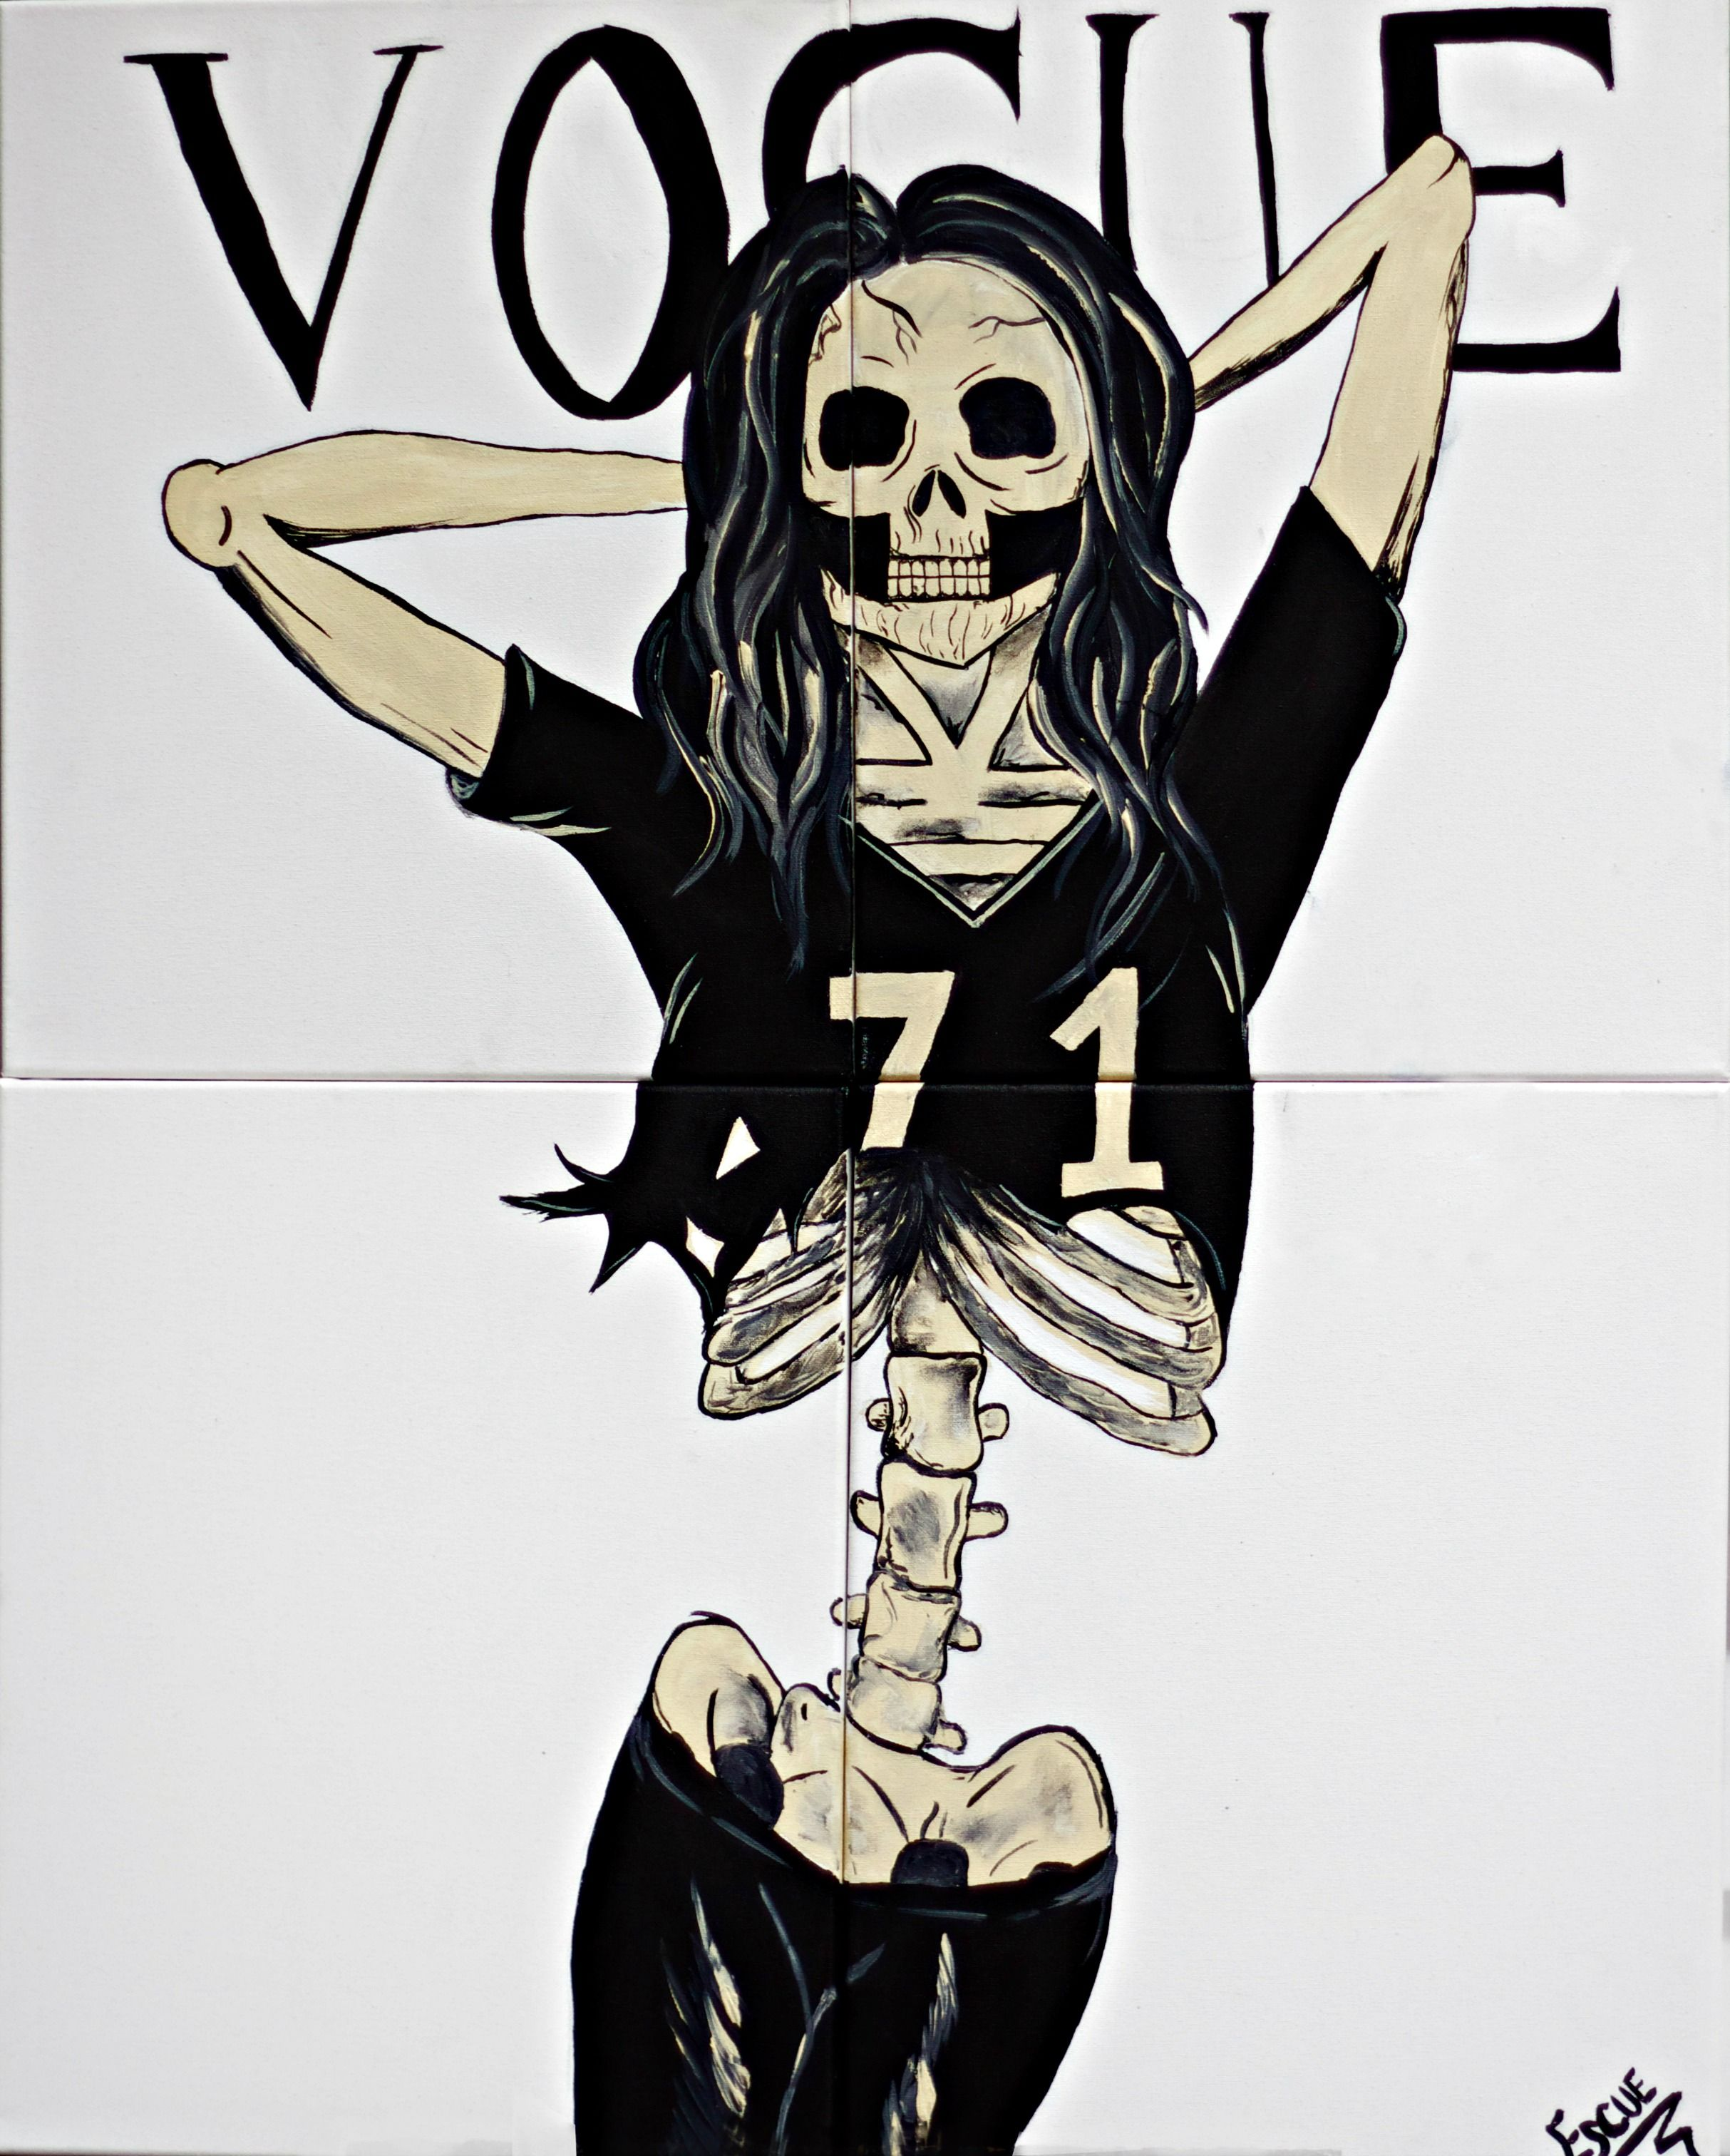 The true Vogue model. Artist: Kelsey Escue